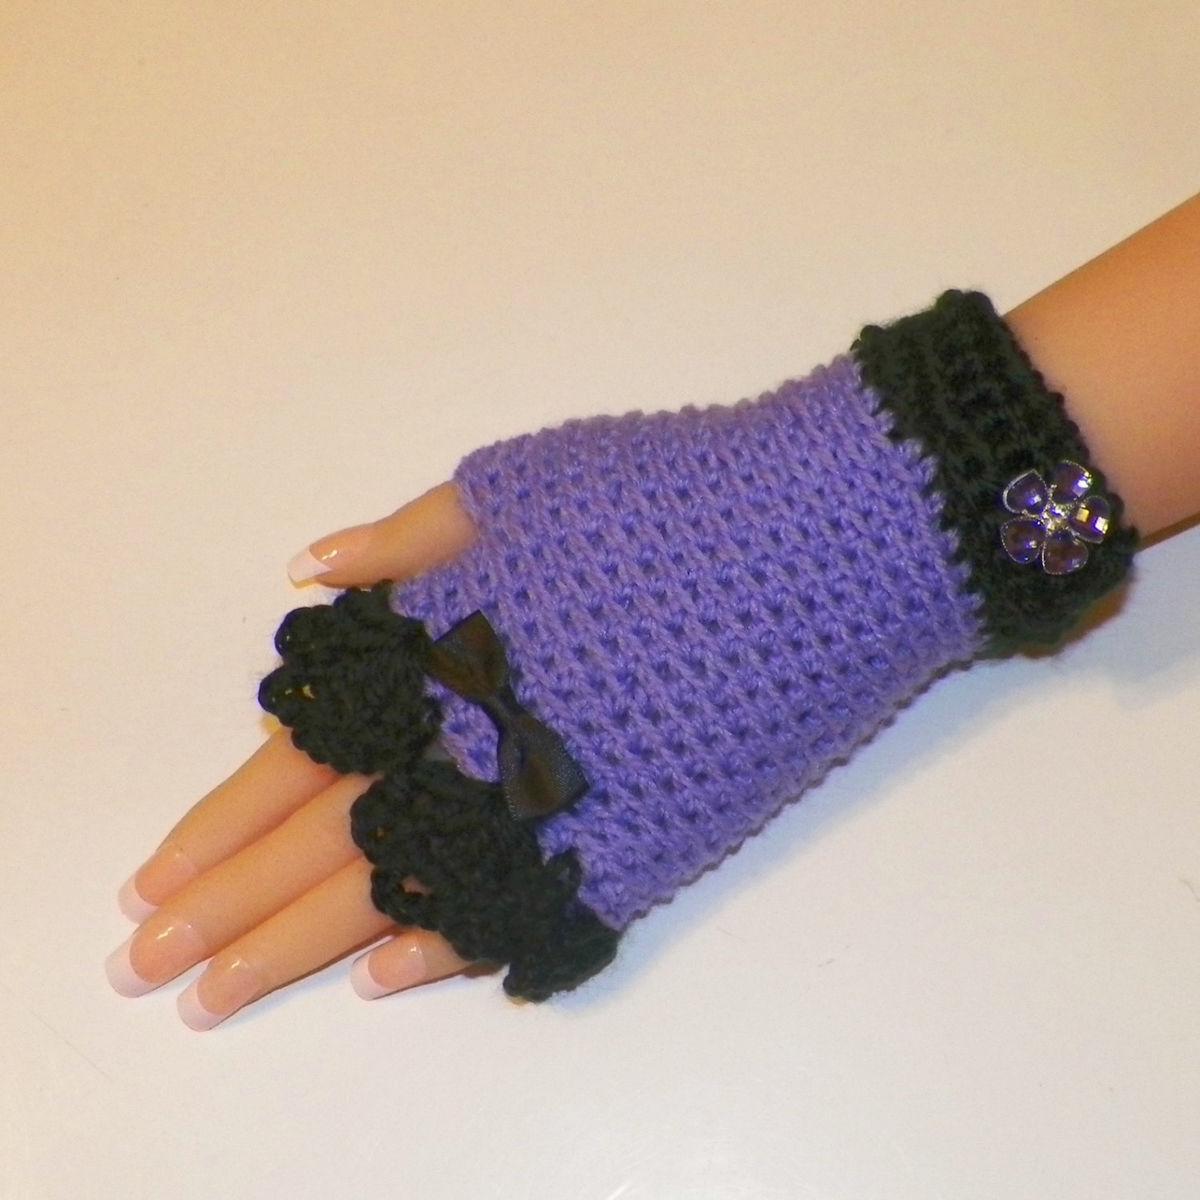 baf8ff66f Purple Black Gothic Fingerless Gloves Lace Button Steampunk ...